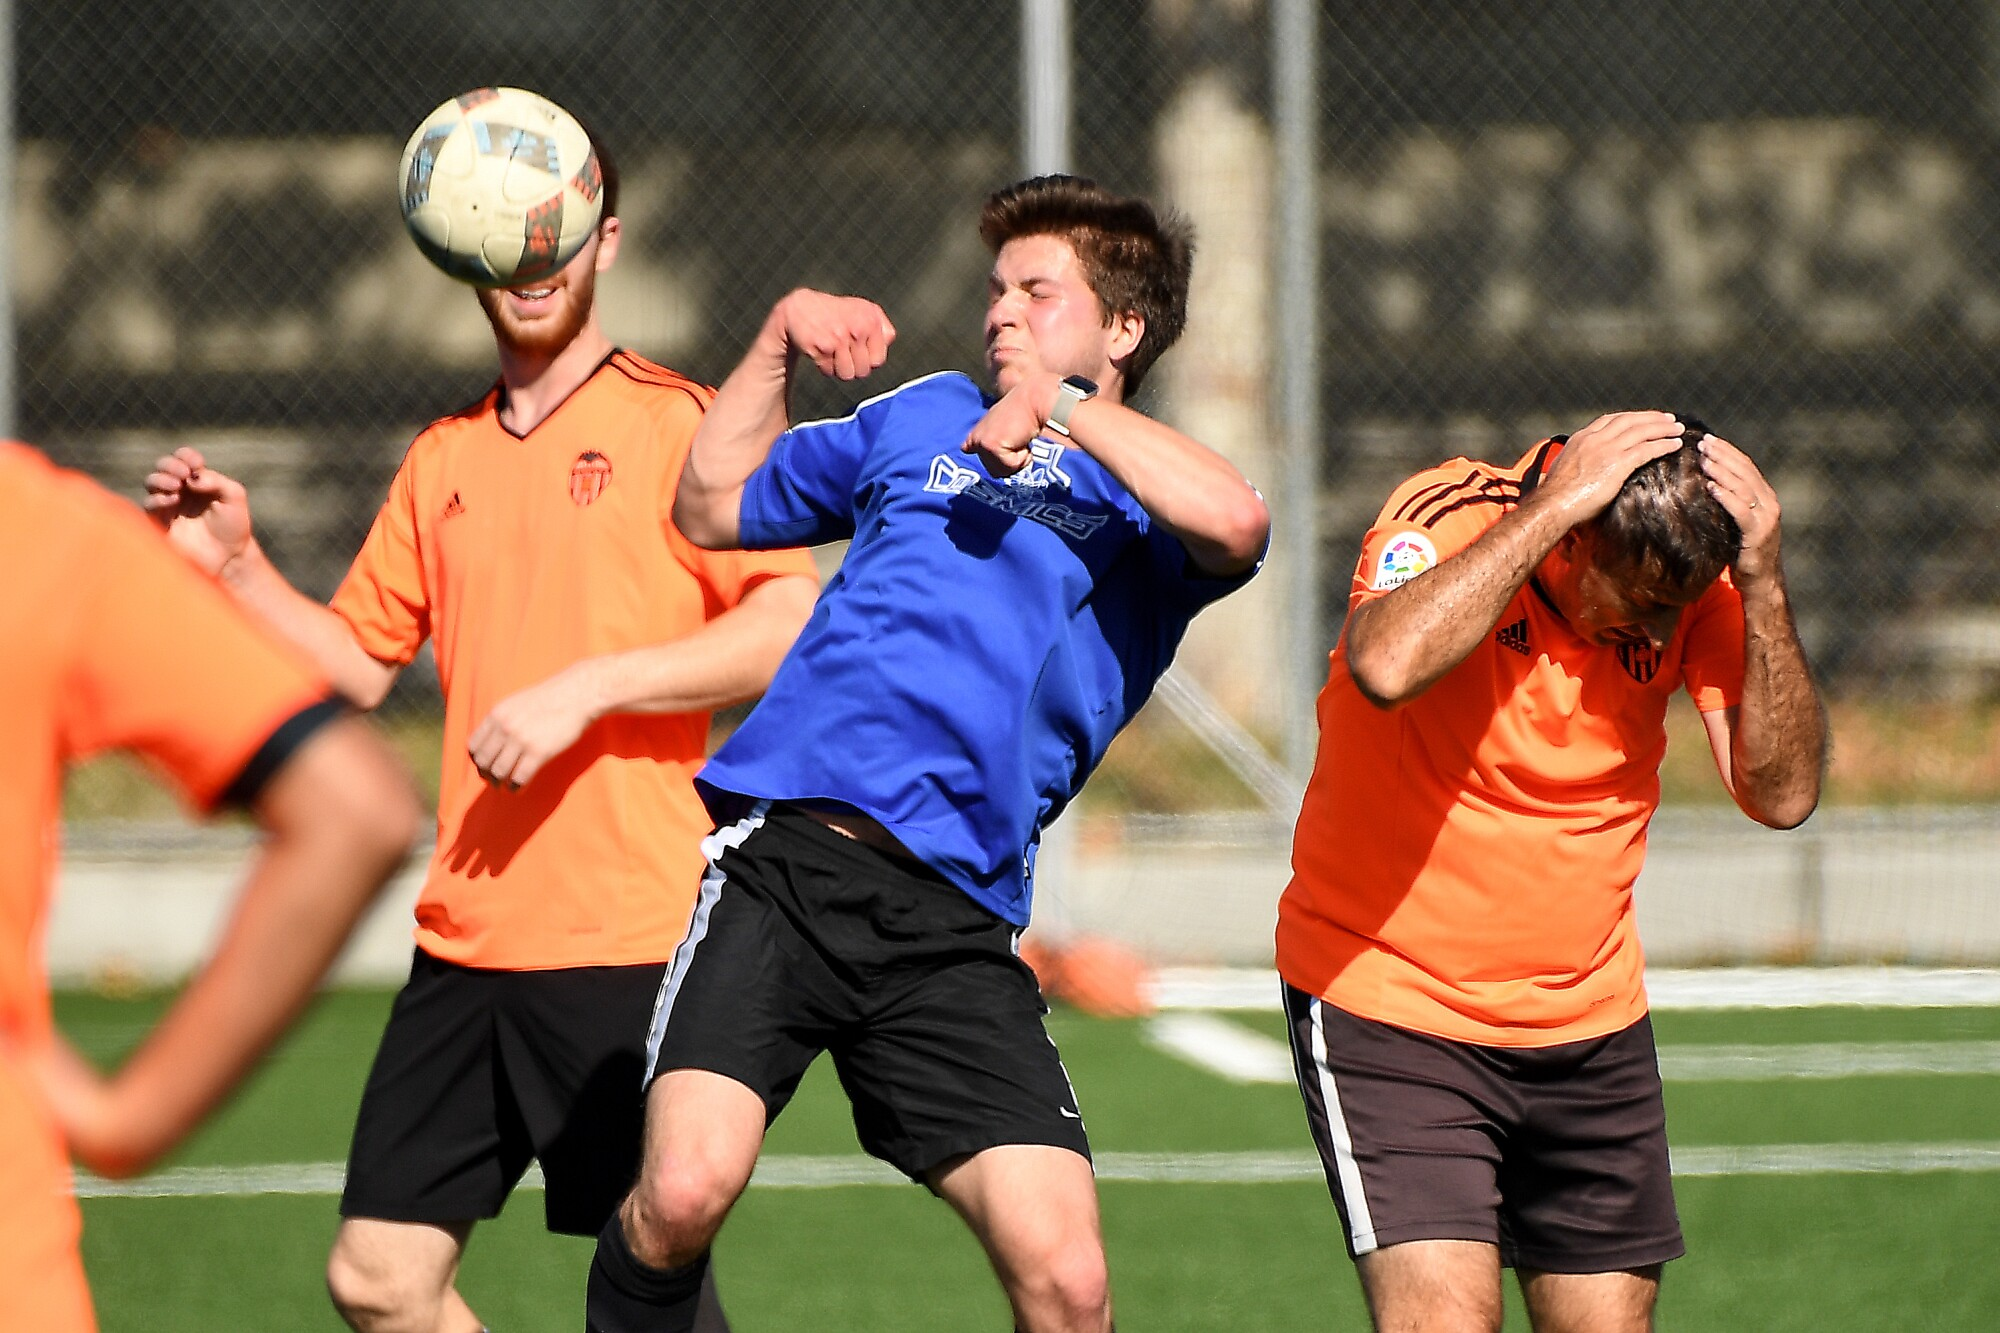 Robert Gray, center, battles for the ball during a Nerd Soccer League game at Caltech in Pasadena.